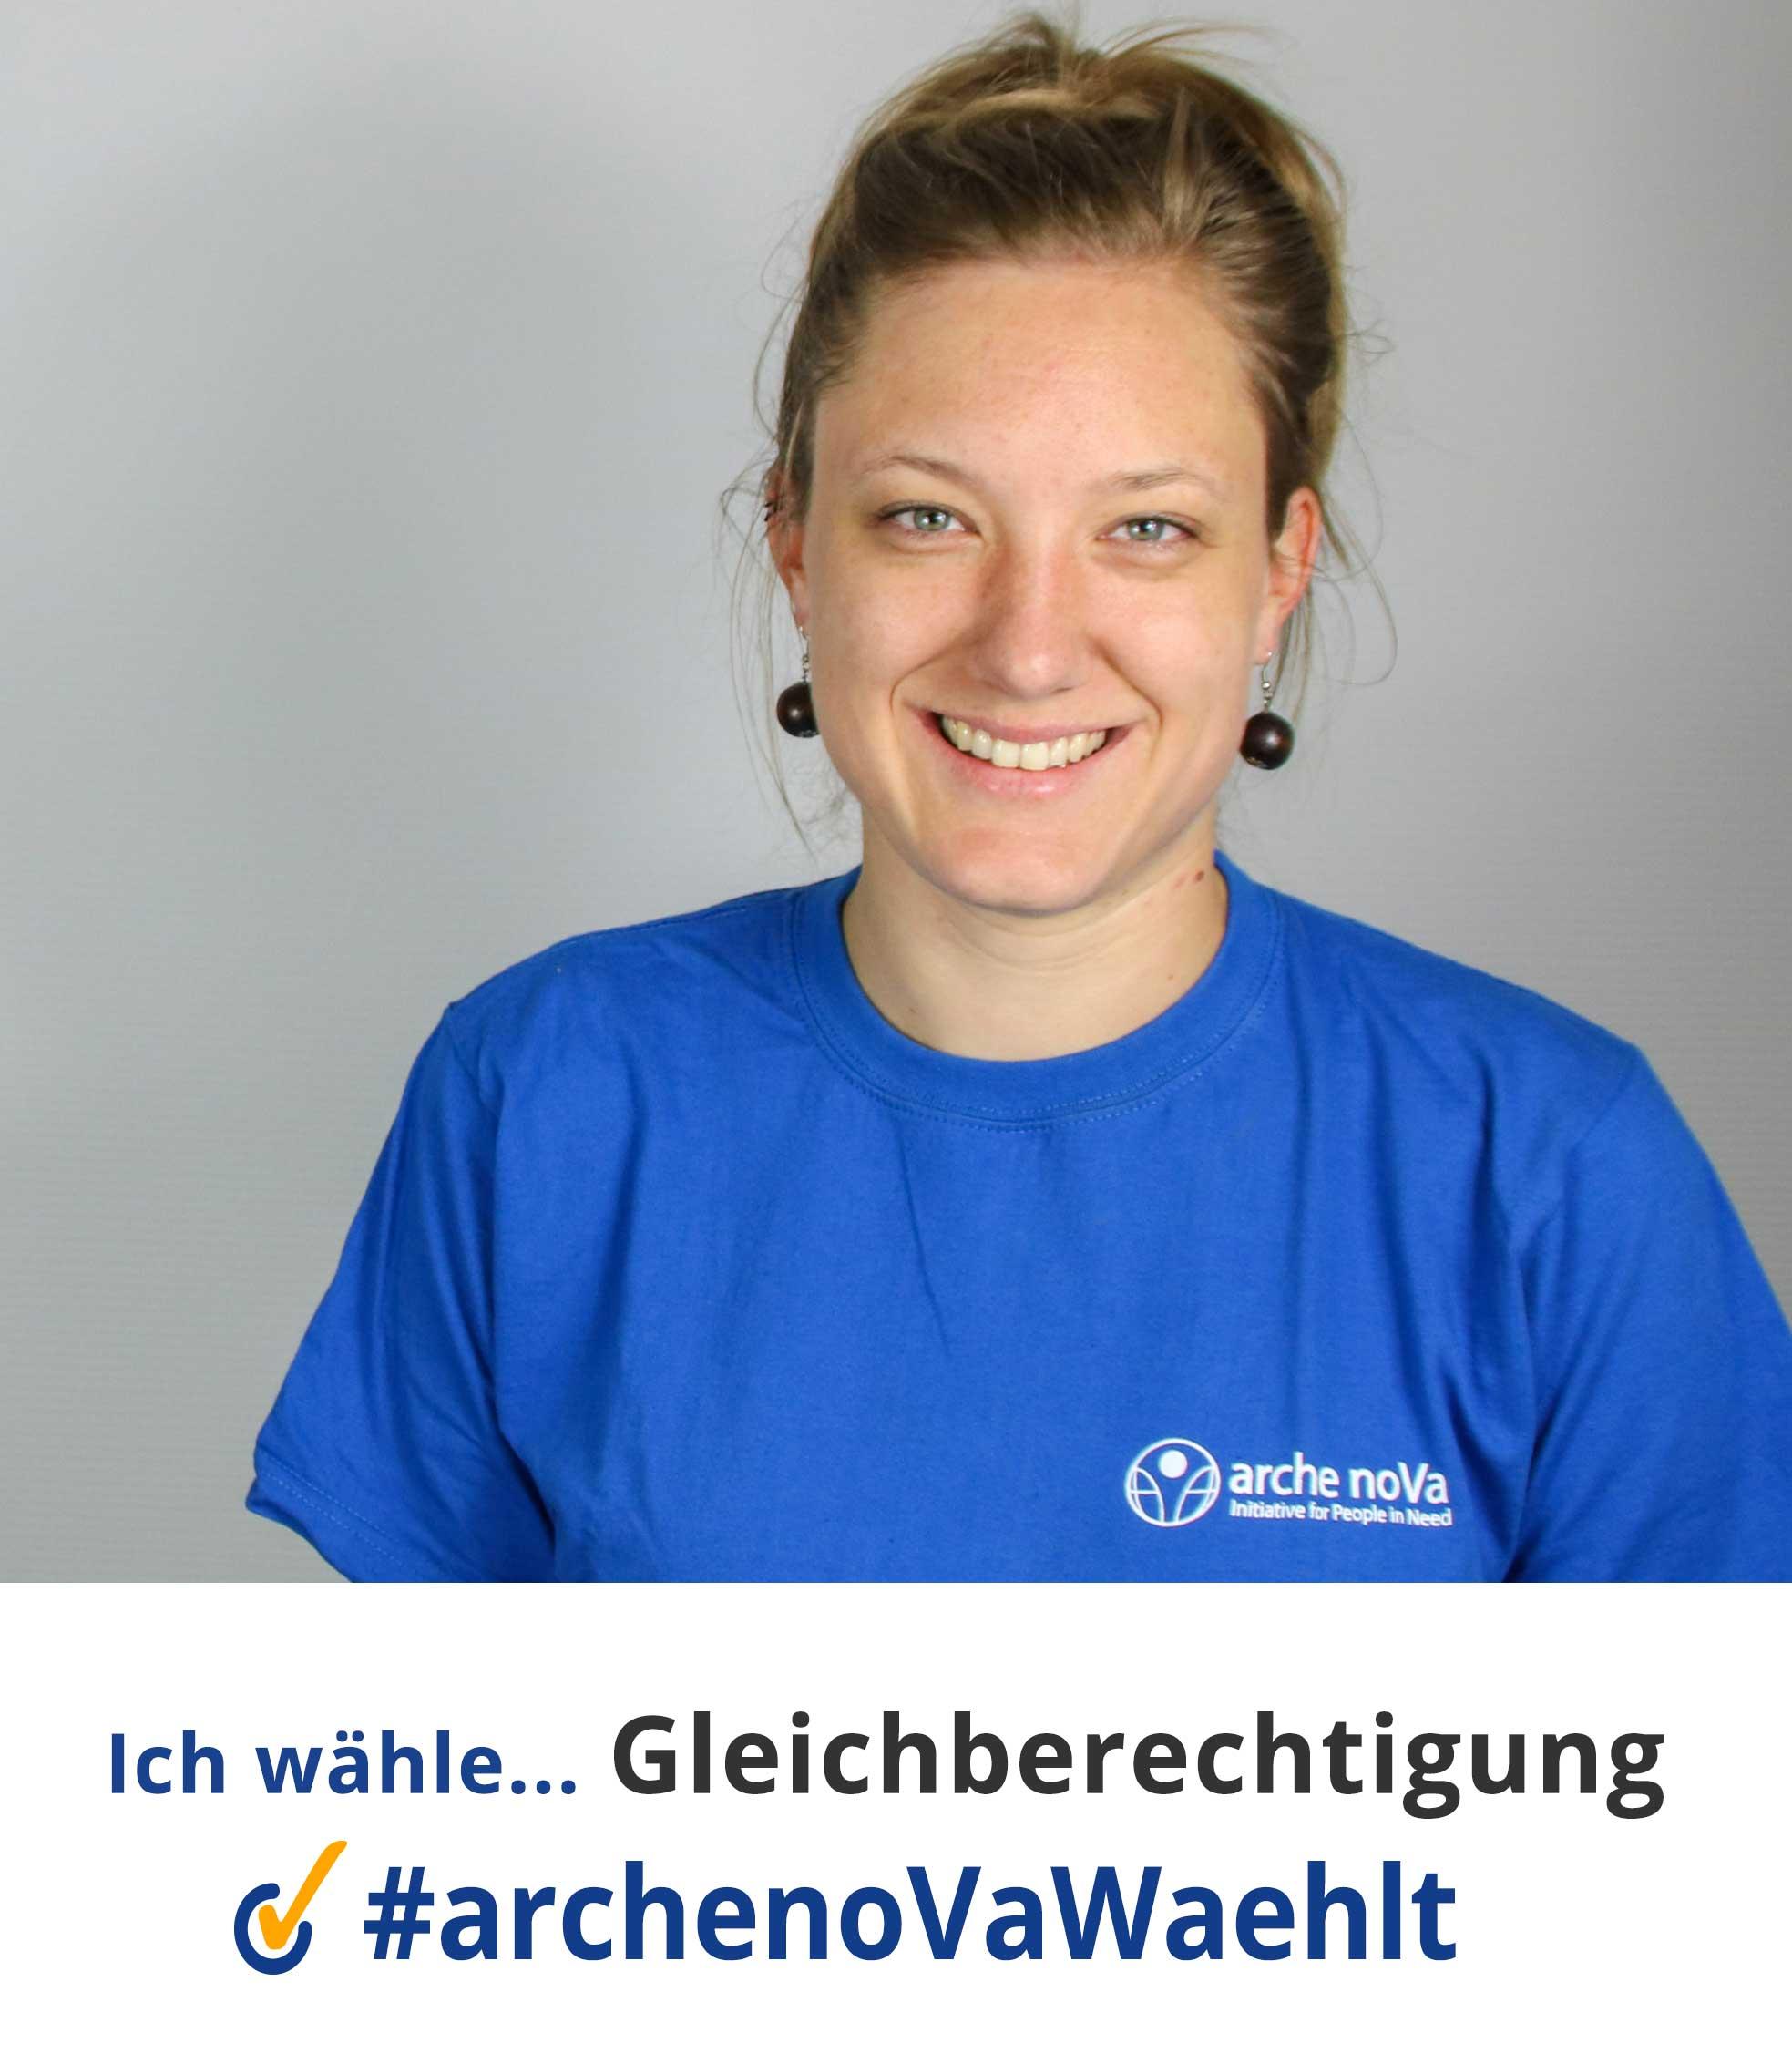 Janina / arche noVa ww'hlt Landtagswahlen Sachsen 2019